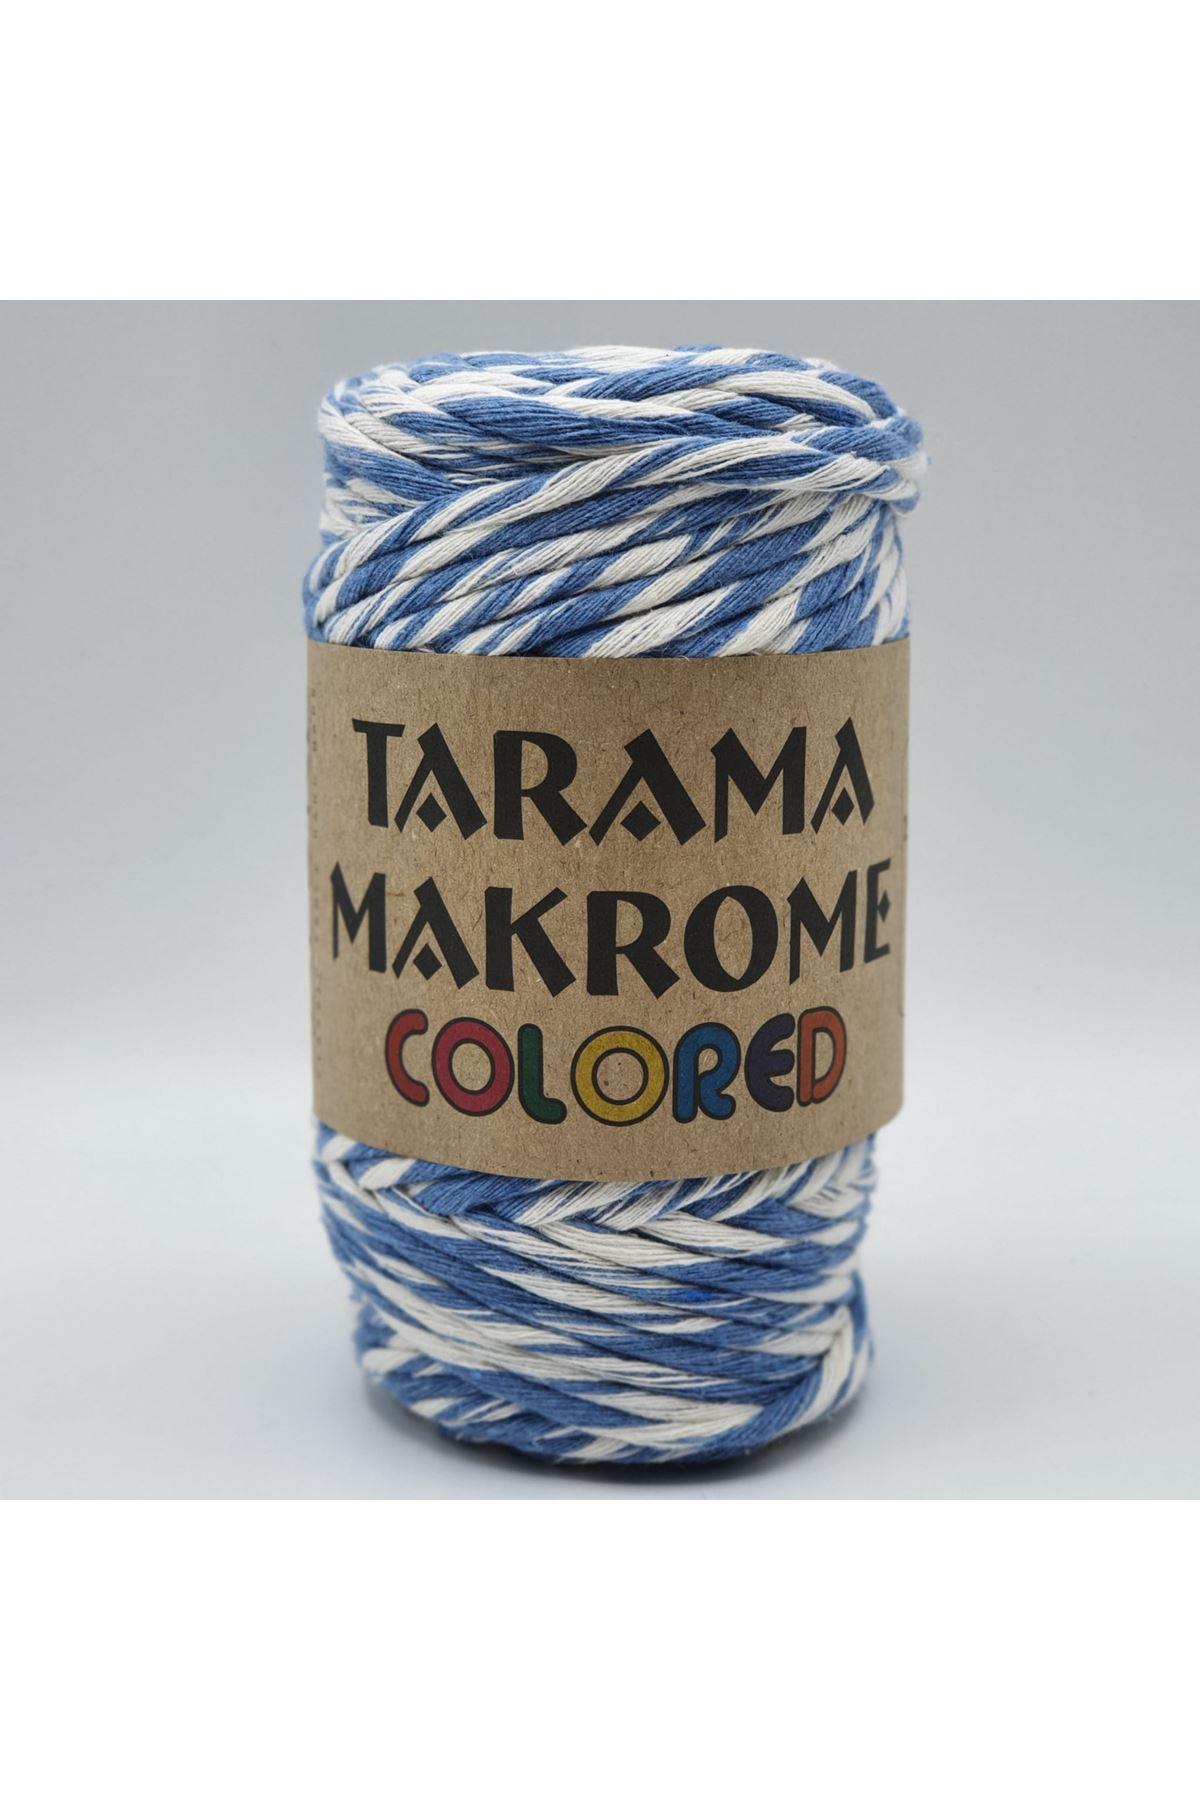 Tarama Makrome Colored 5 mm - 13